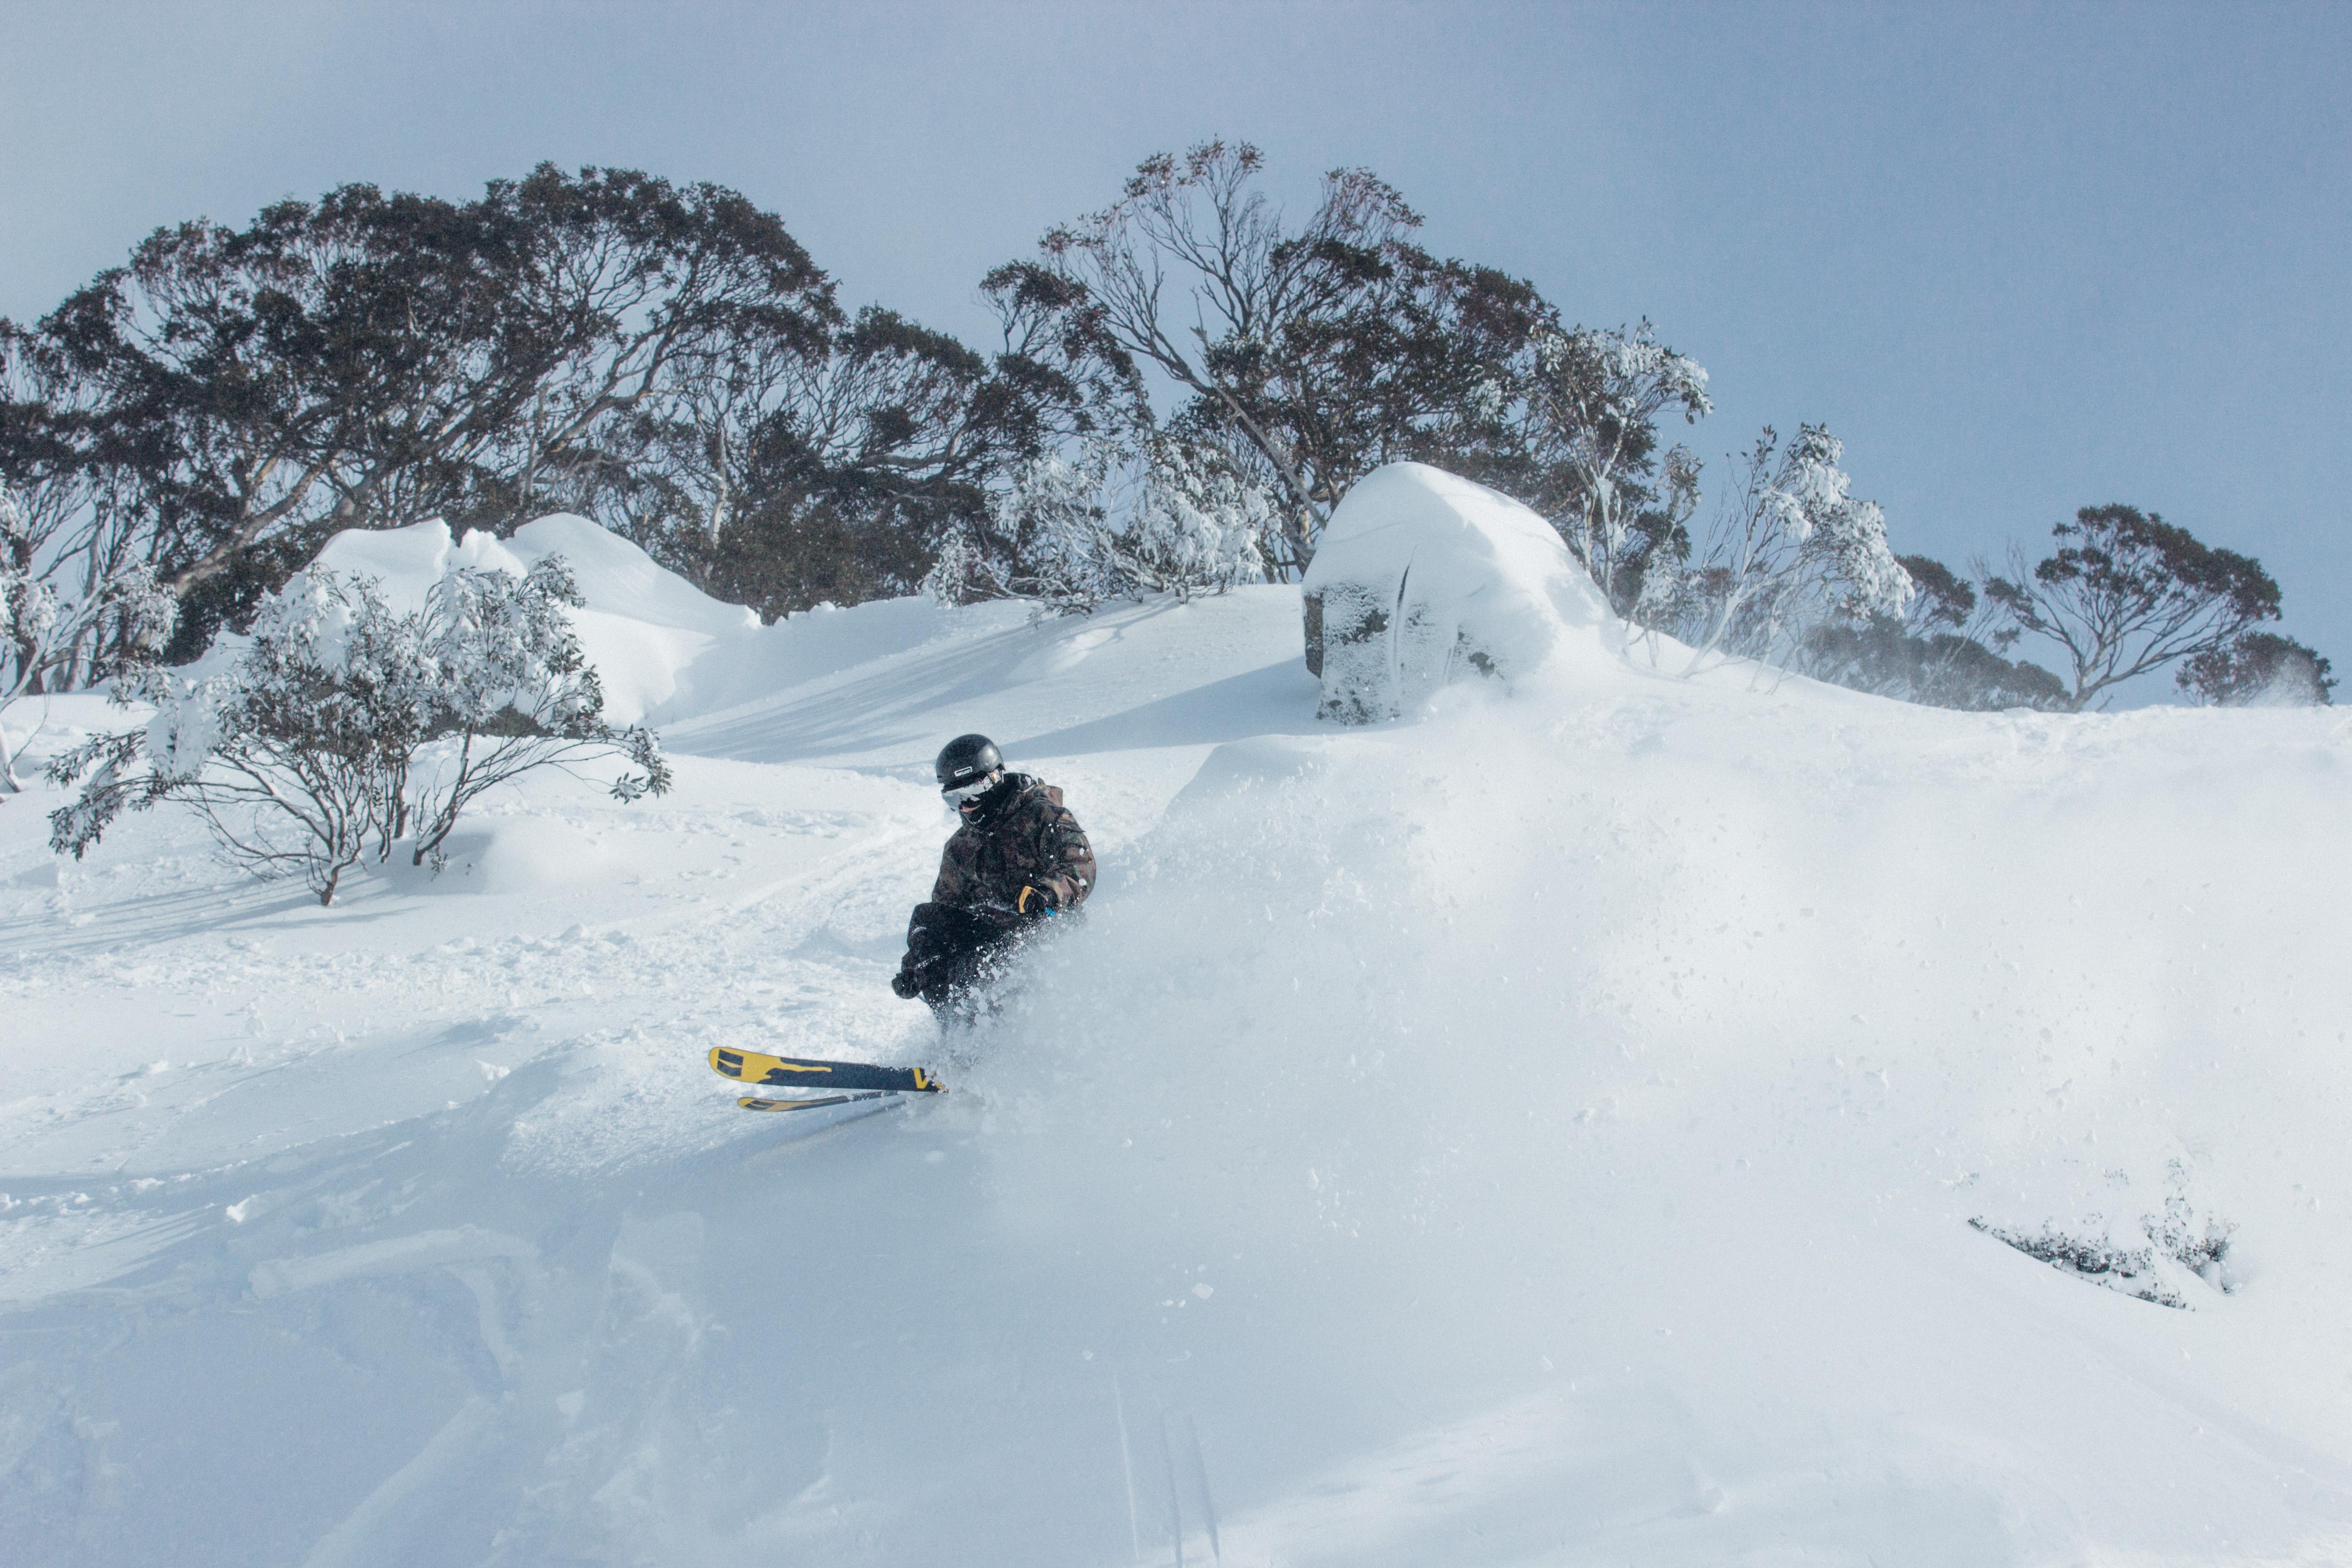 Skiing Powder at Perisher